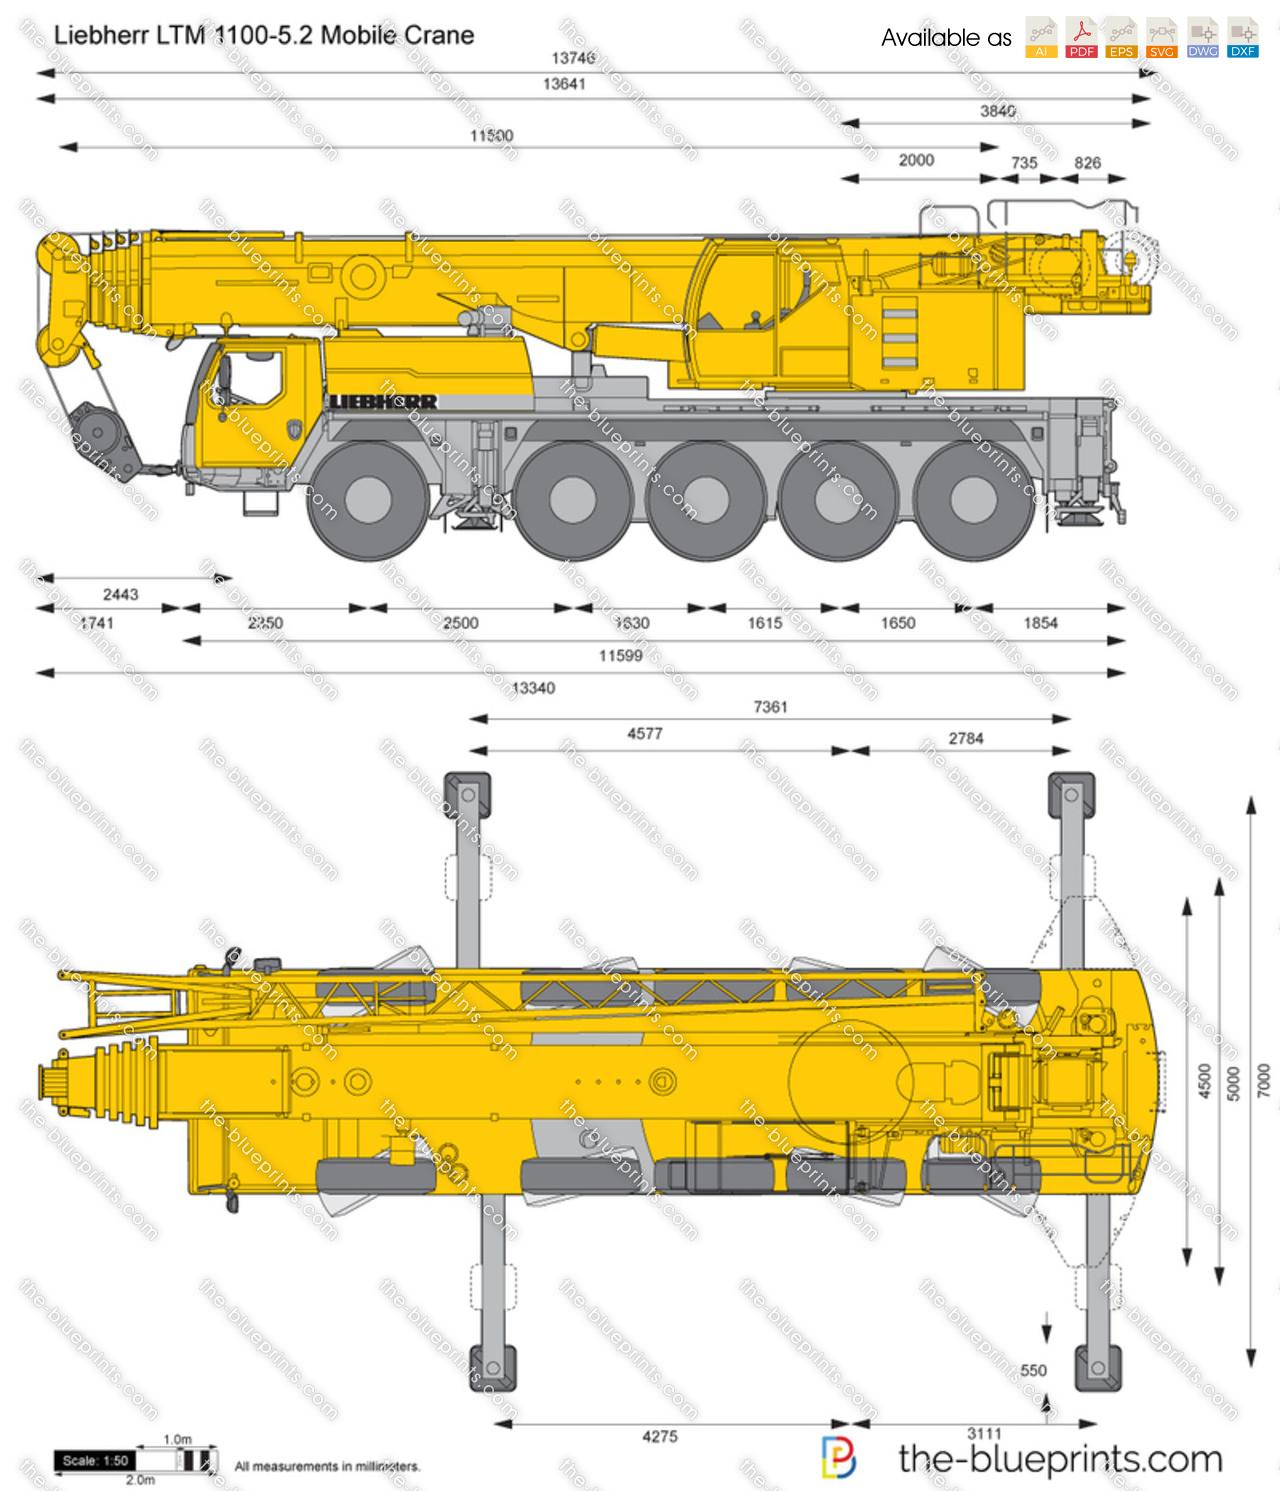 Liebherr LTM 1100-5.2 Mobile Crane